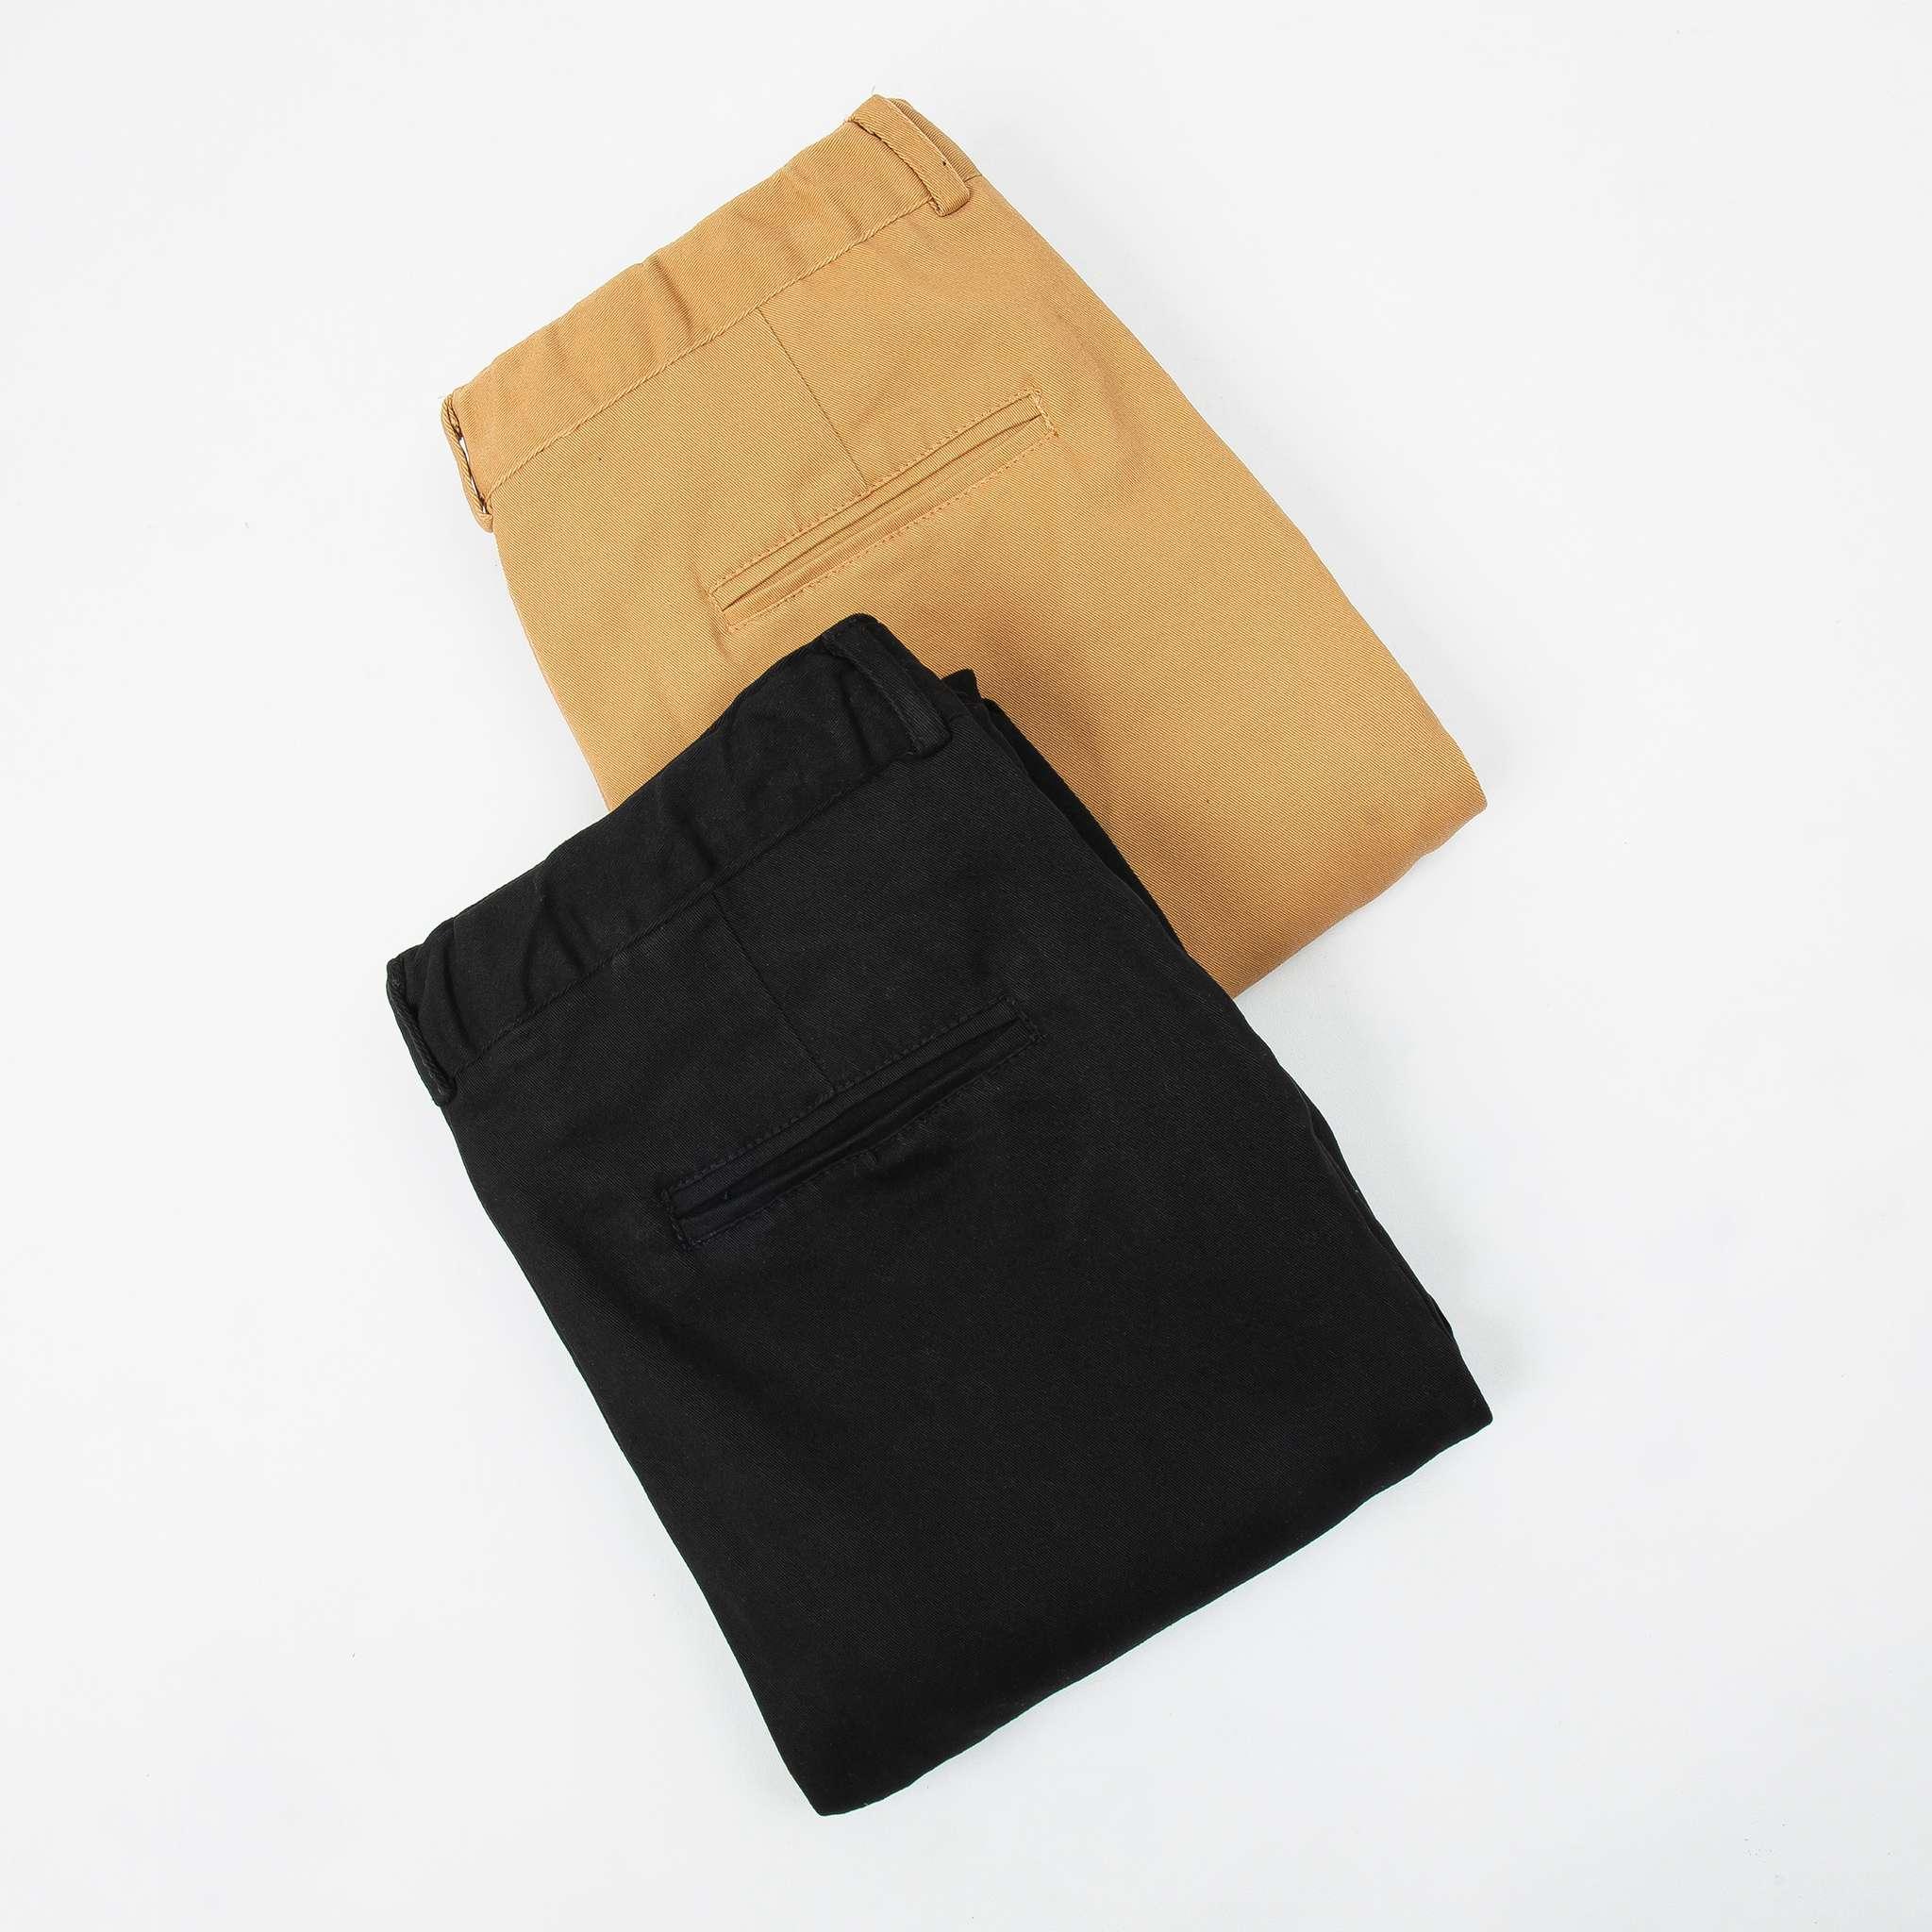 SP256 - Quần Tây Kaki Pocket